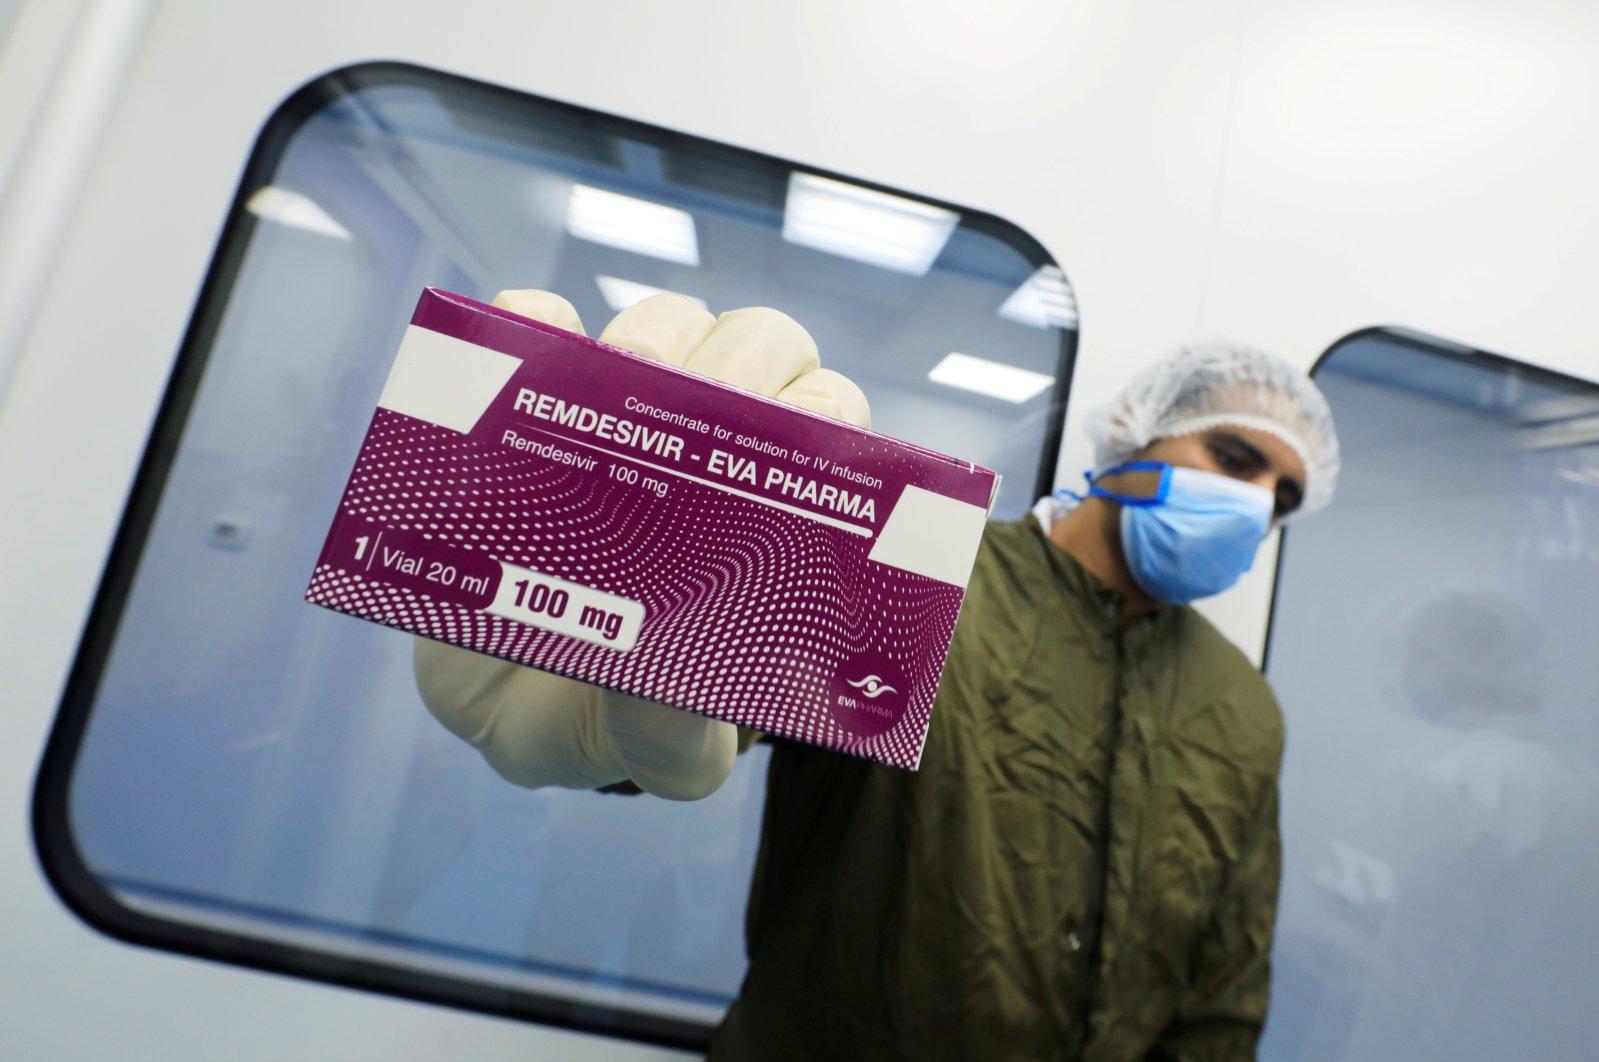 "A lab technician shows the coronavirus disease (COVID-19) treatment drug ""Remdesivir"" at Eva Pharma Facility in Cairo, Egypt, June 25, 2020. (Reuters Photo)"